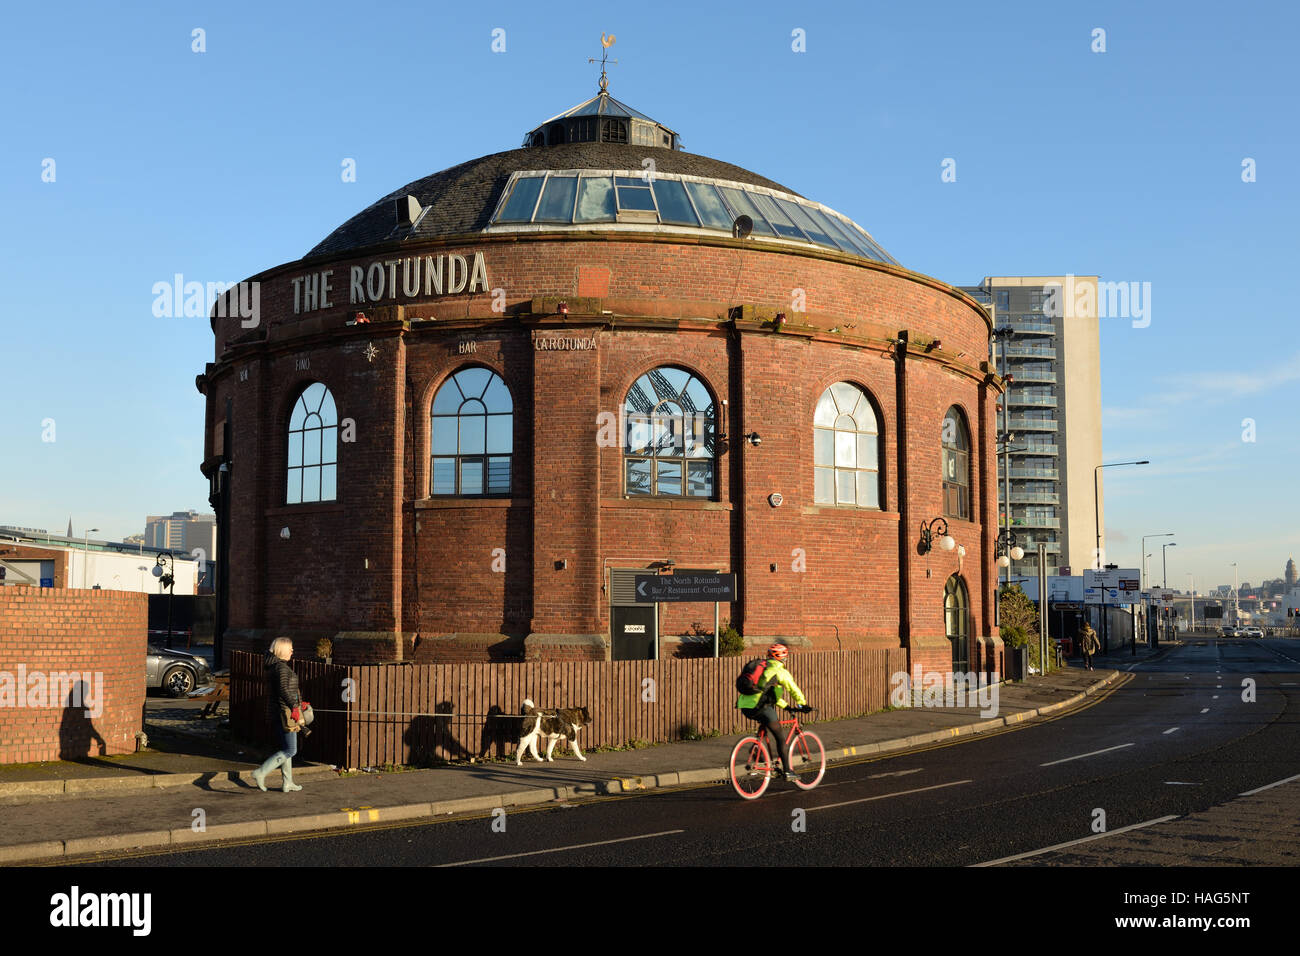 The northern Rotunda restaurant in Finnieston, Glasgow, Scotland, UK - Stock Image